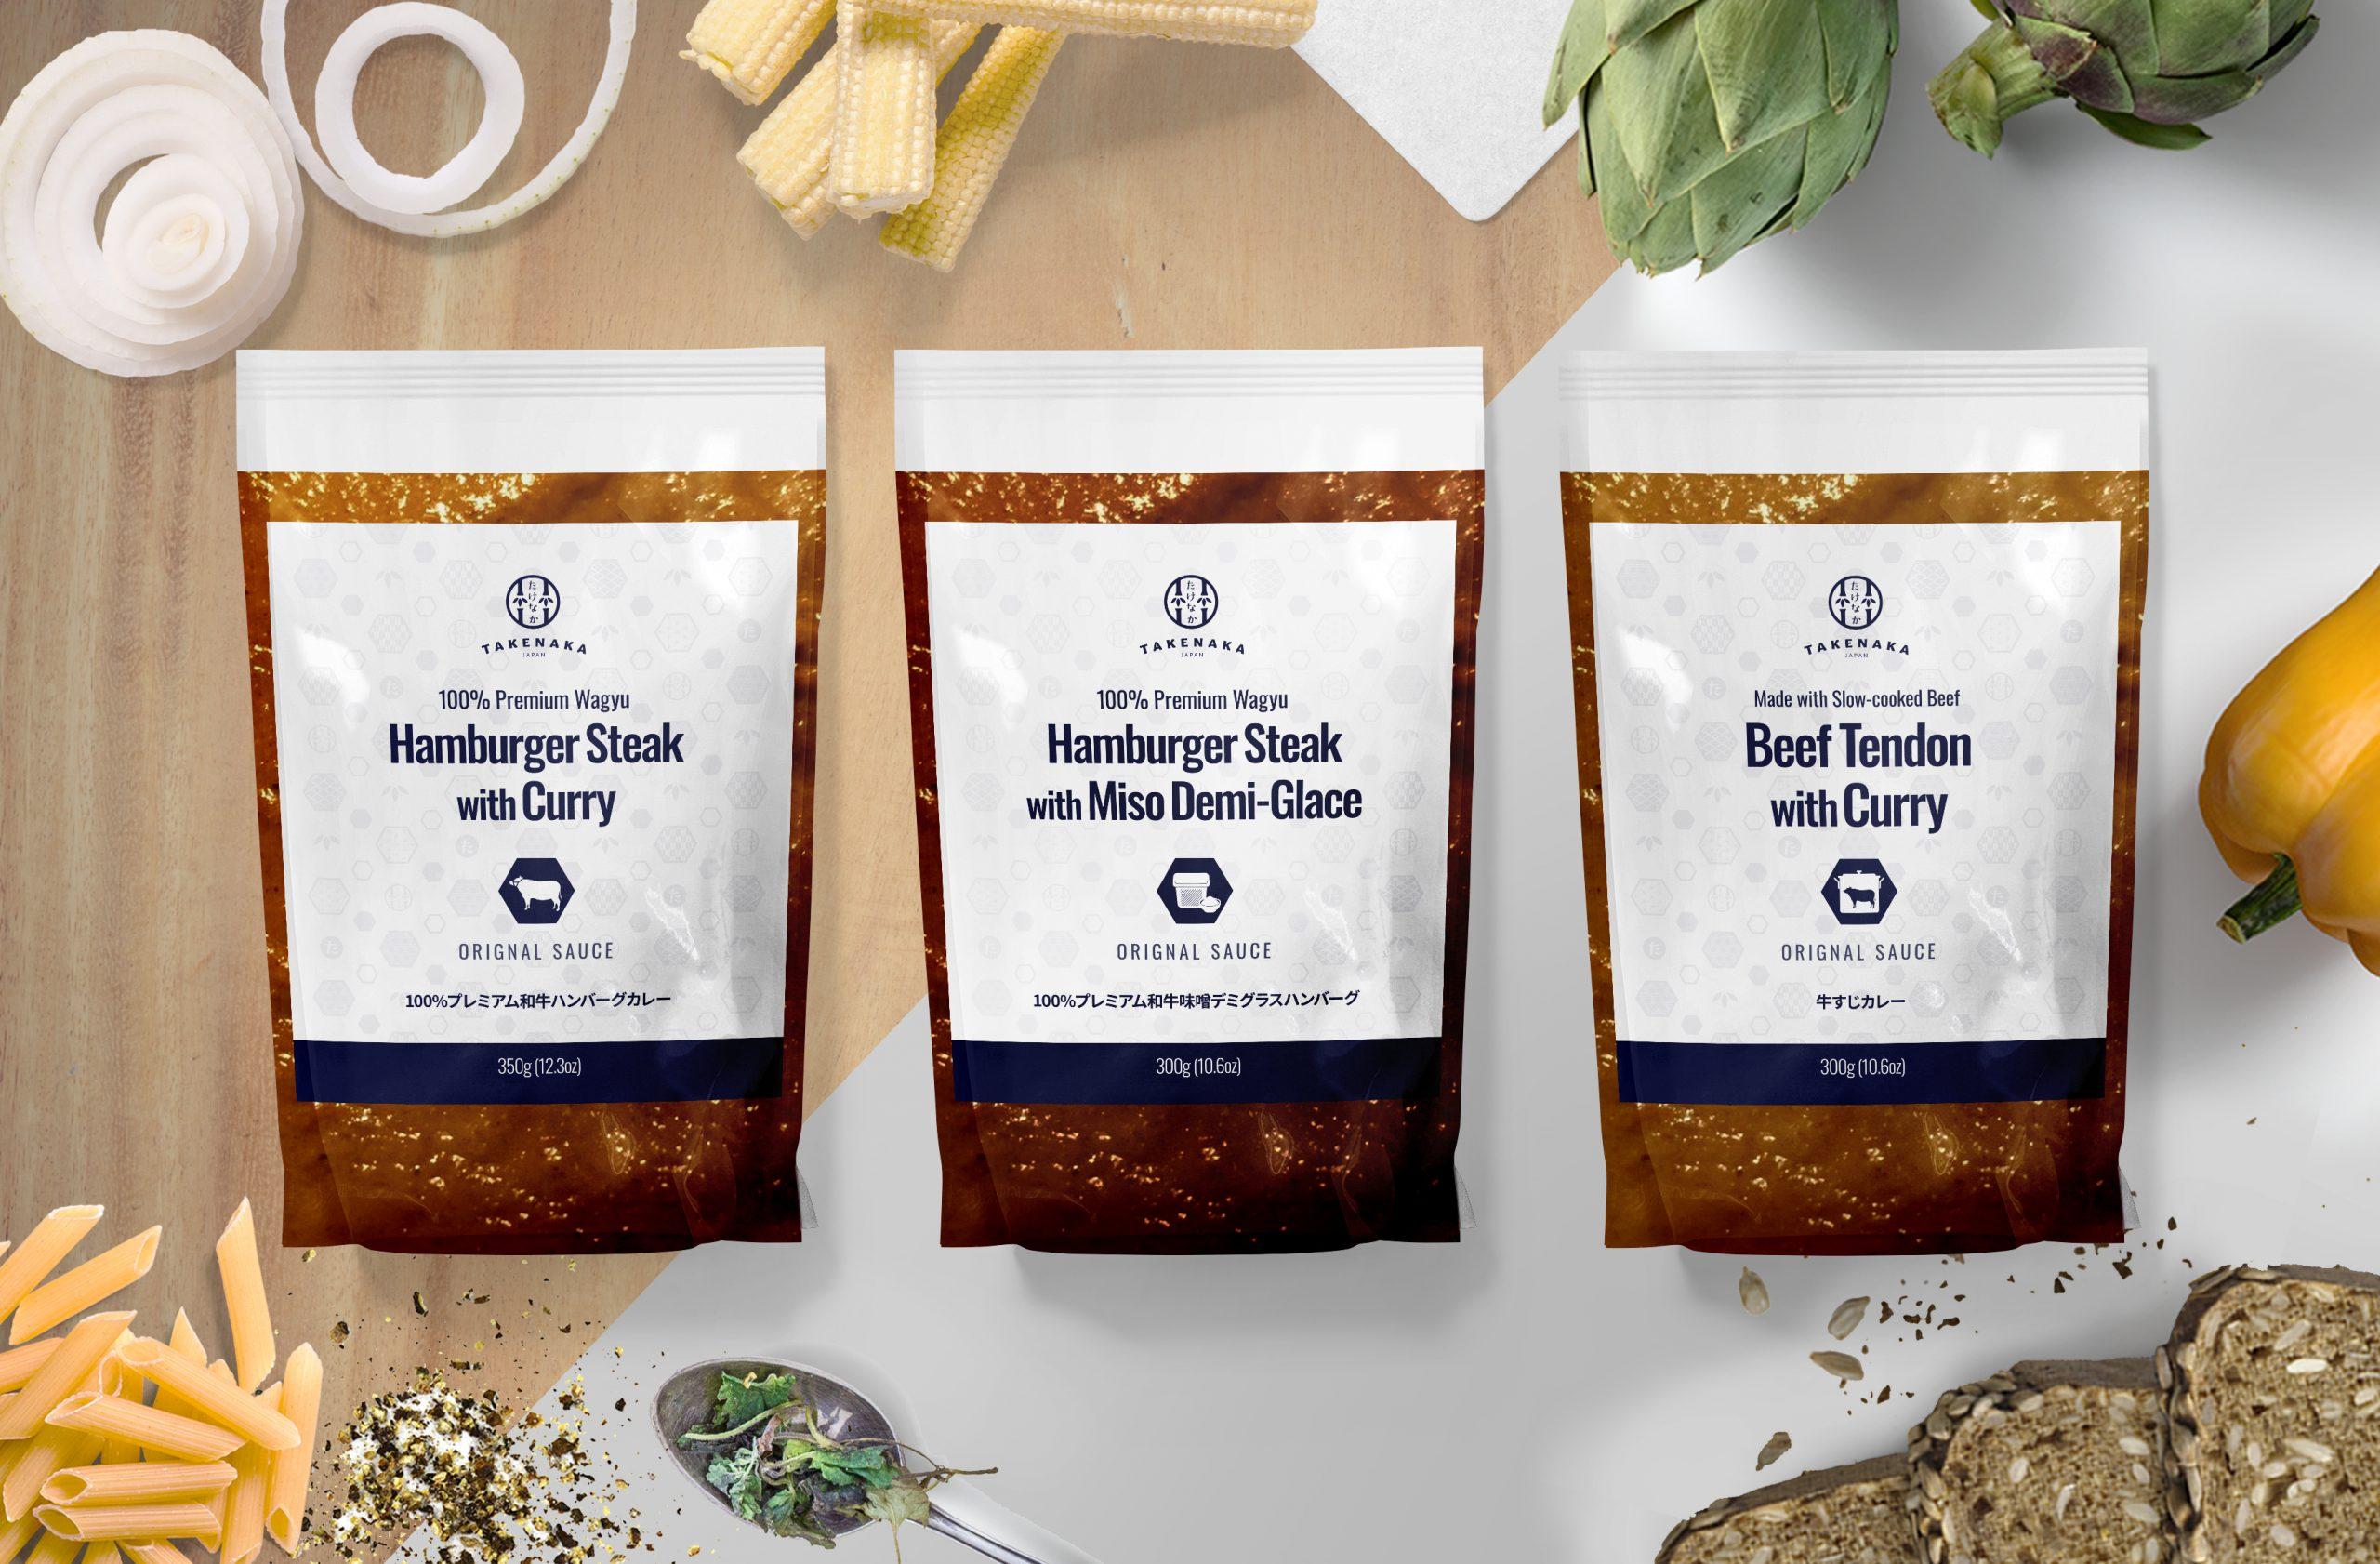 Takenaka Curry and Demi-grace sauce